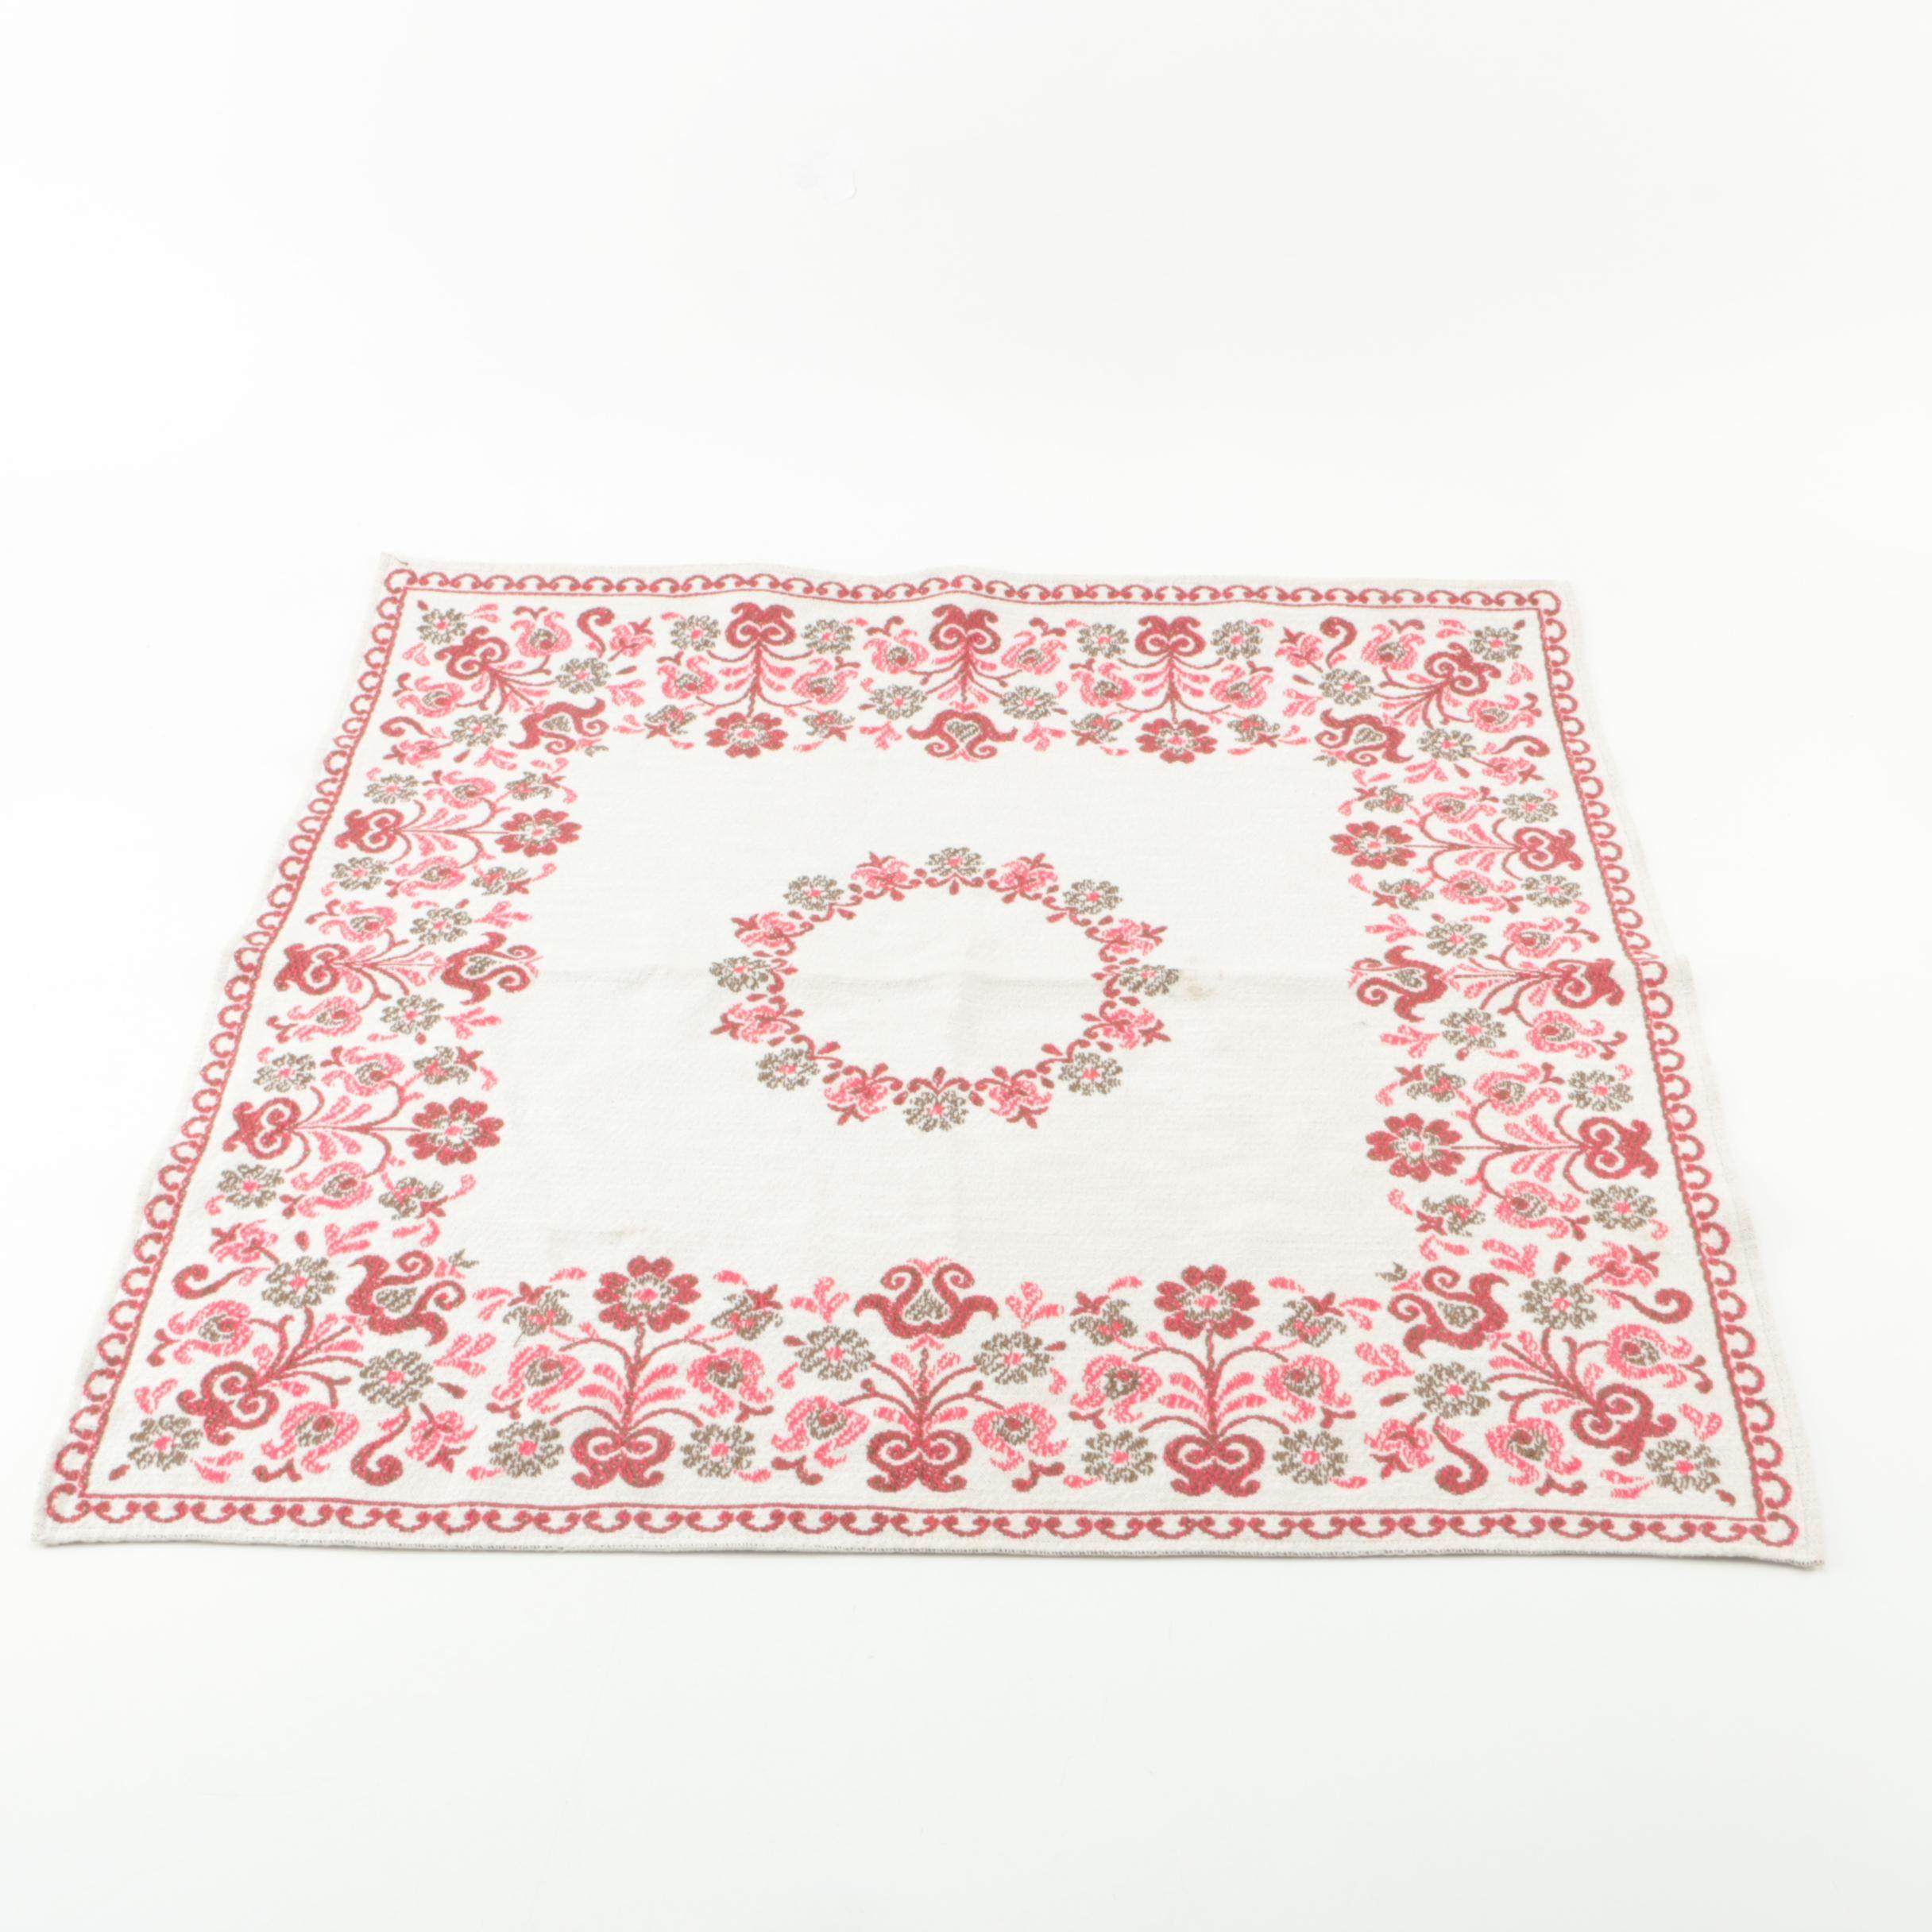 Woven Table Cloth